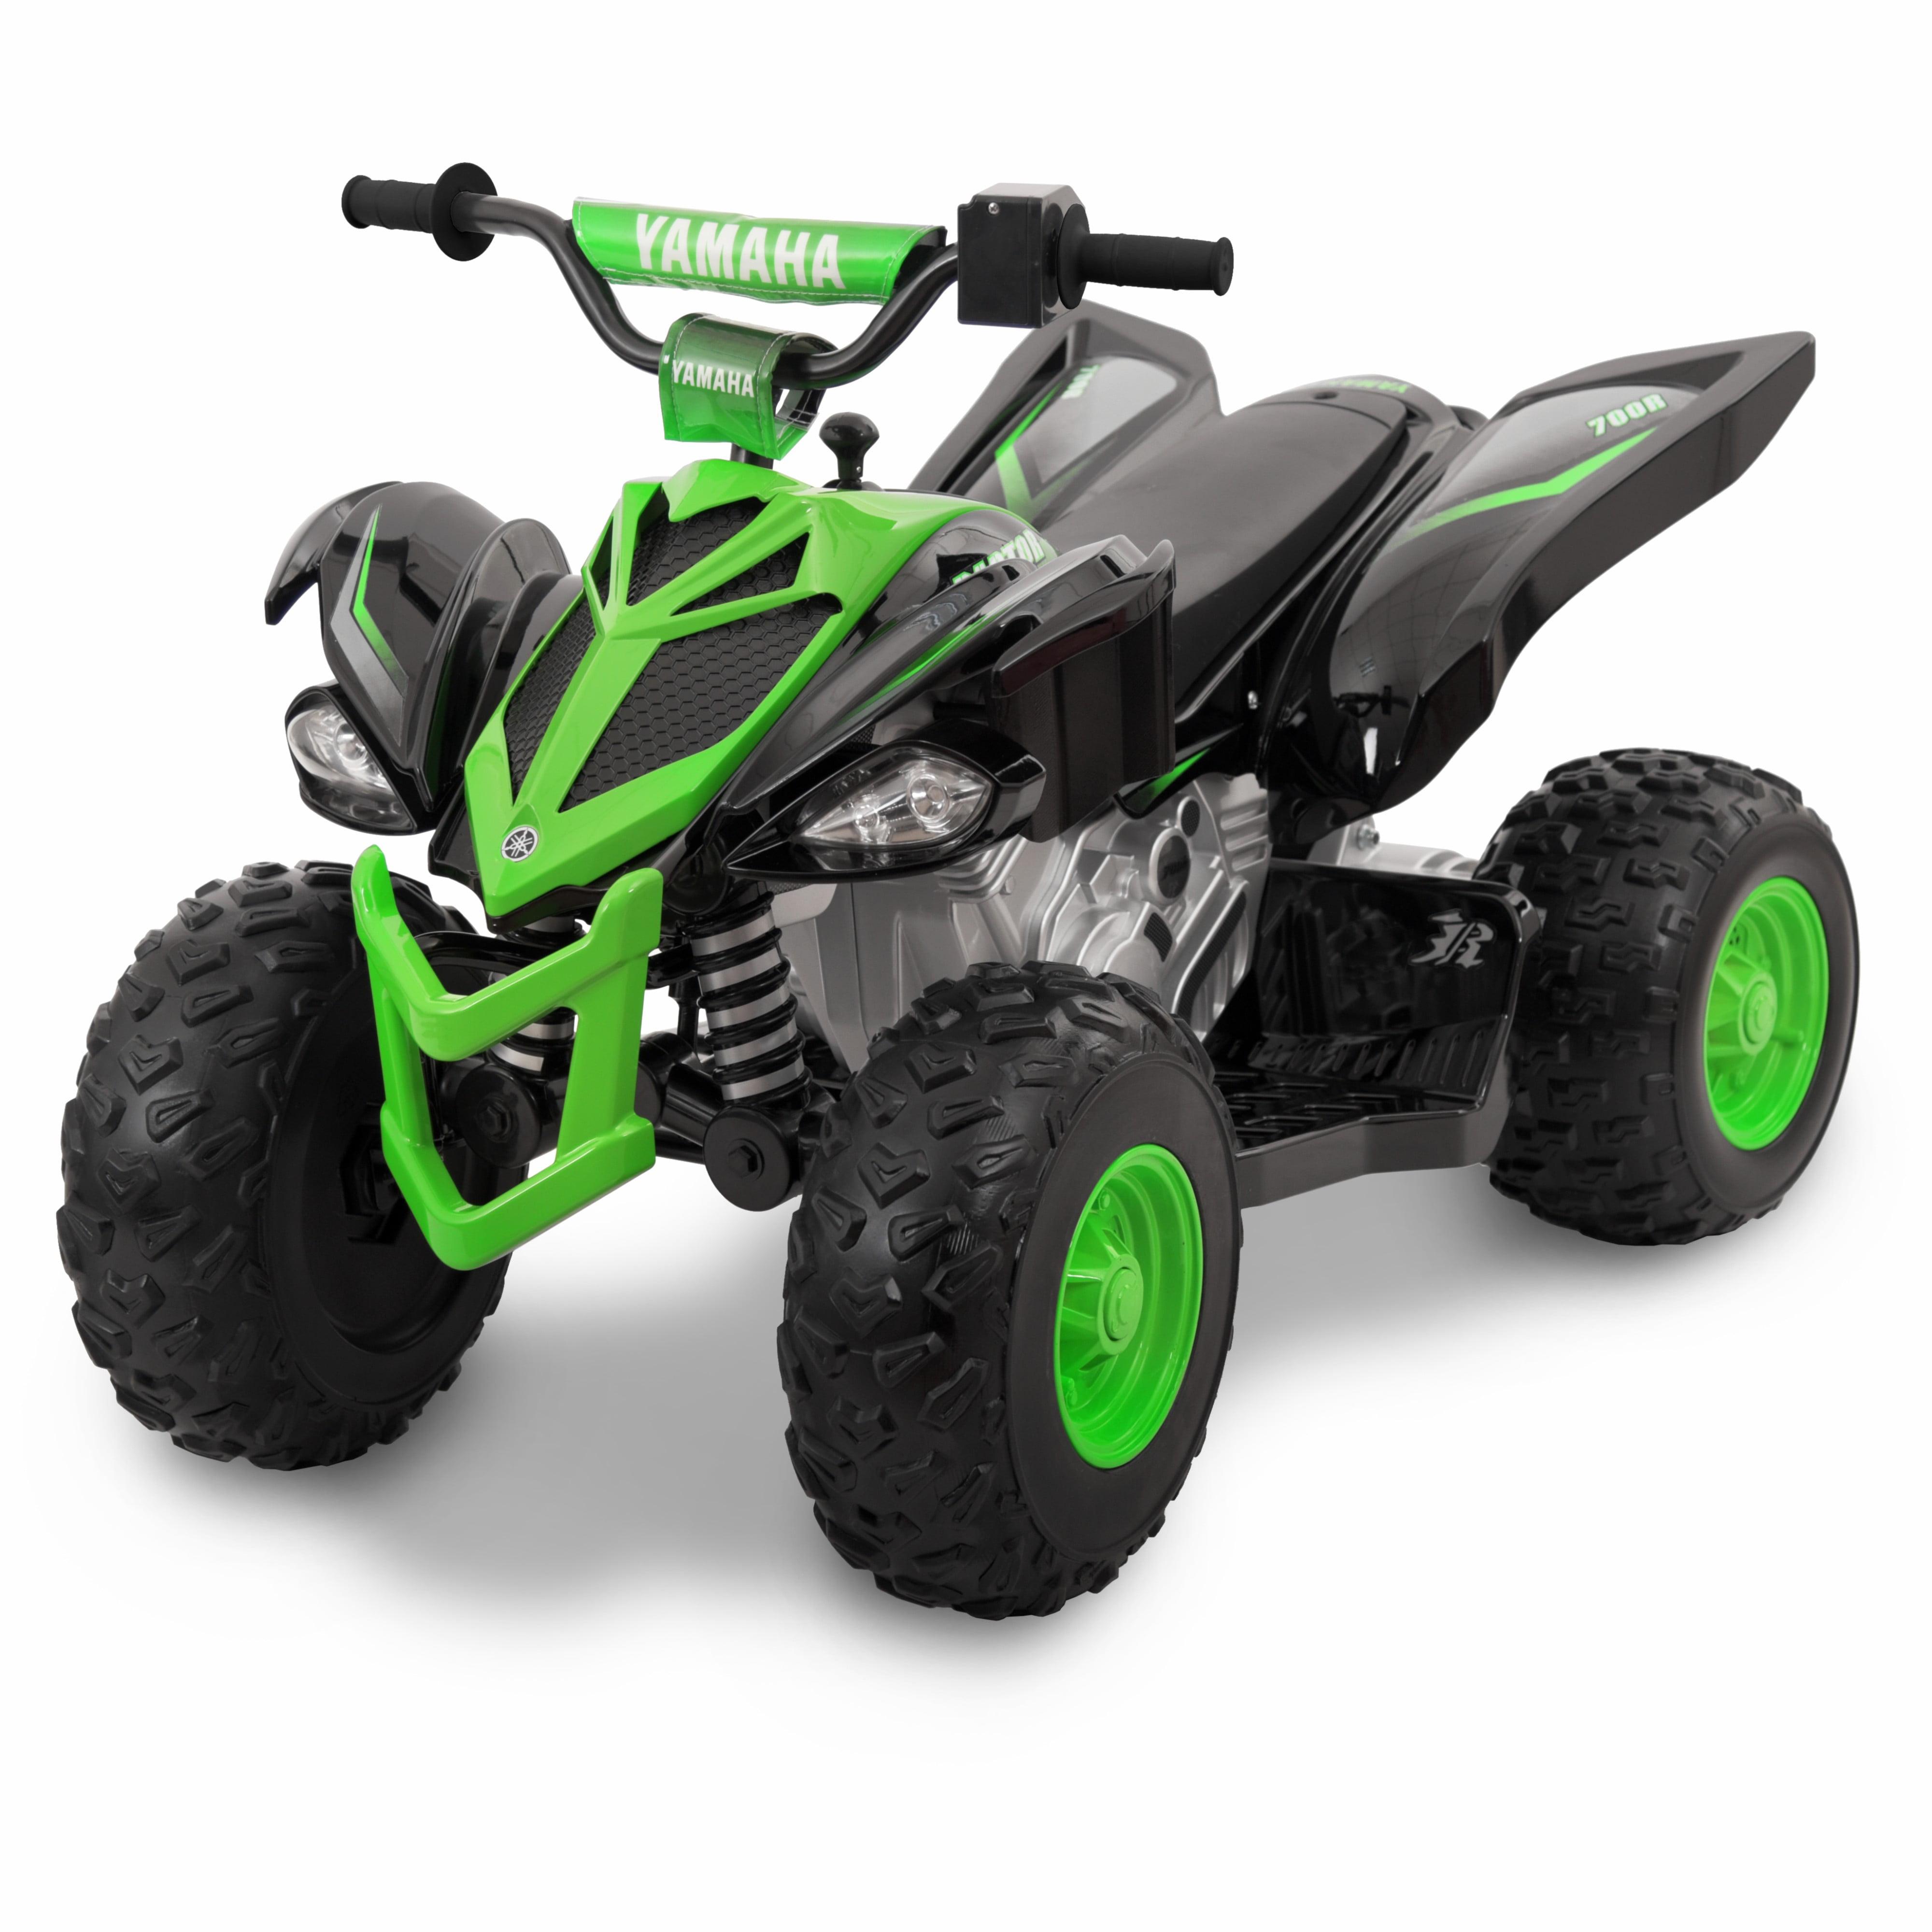 12 Volt Yamaha Raptor Battery Powered Ride-on Black/Green